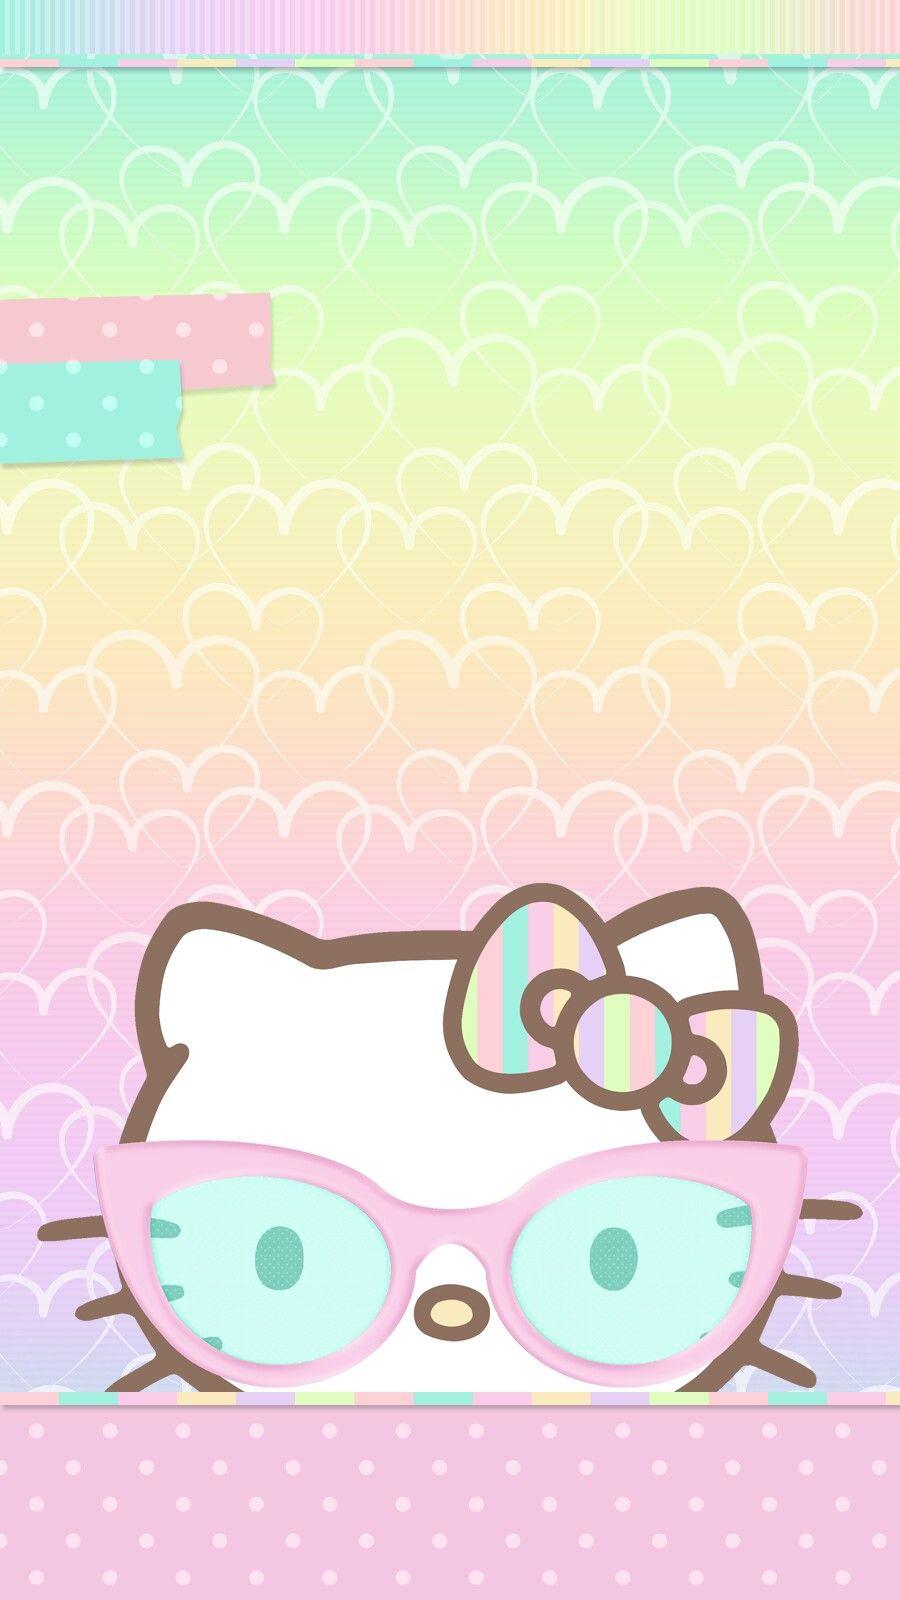 Most Inspiring Wallpaper Hello Kitty Pastel - f389b647e7ce43b59ed781eb6d73898b  You Should Have_426047.jpg